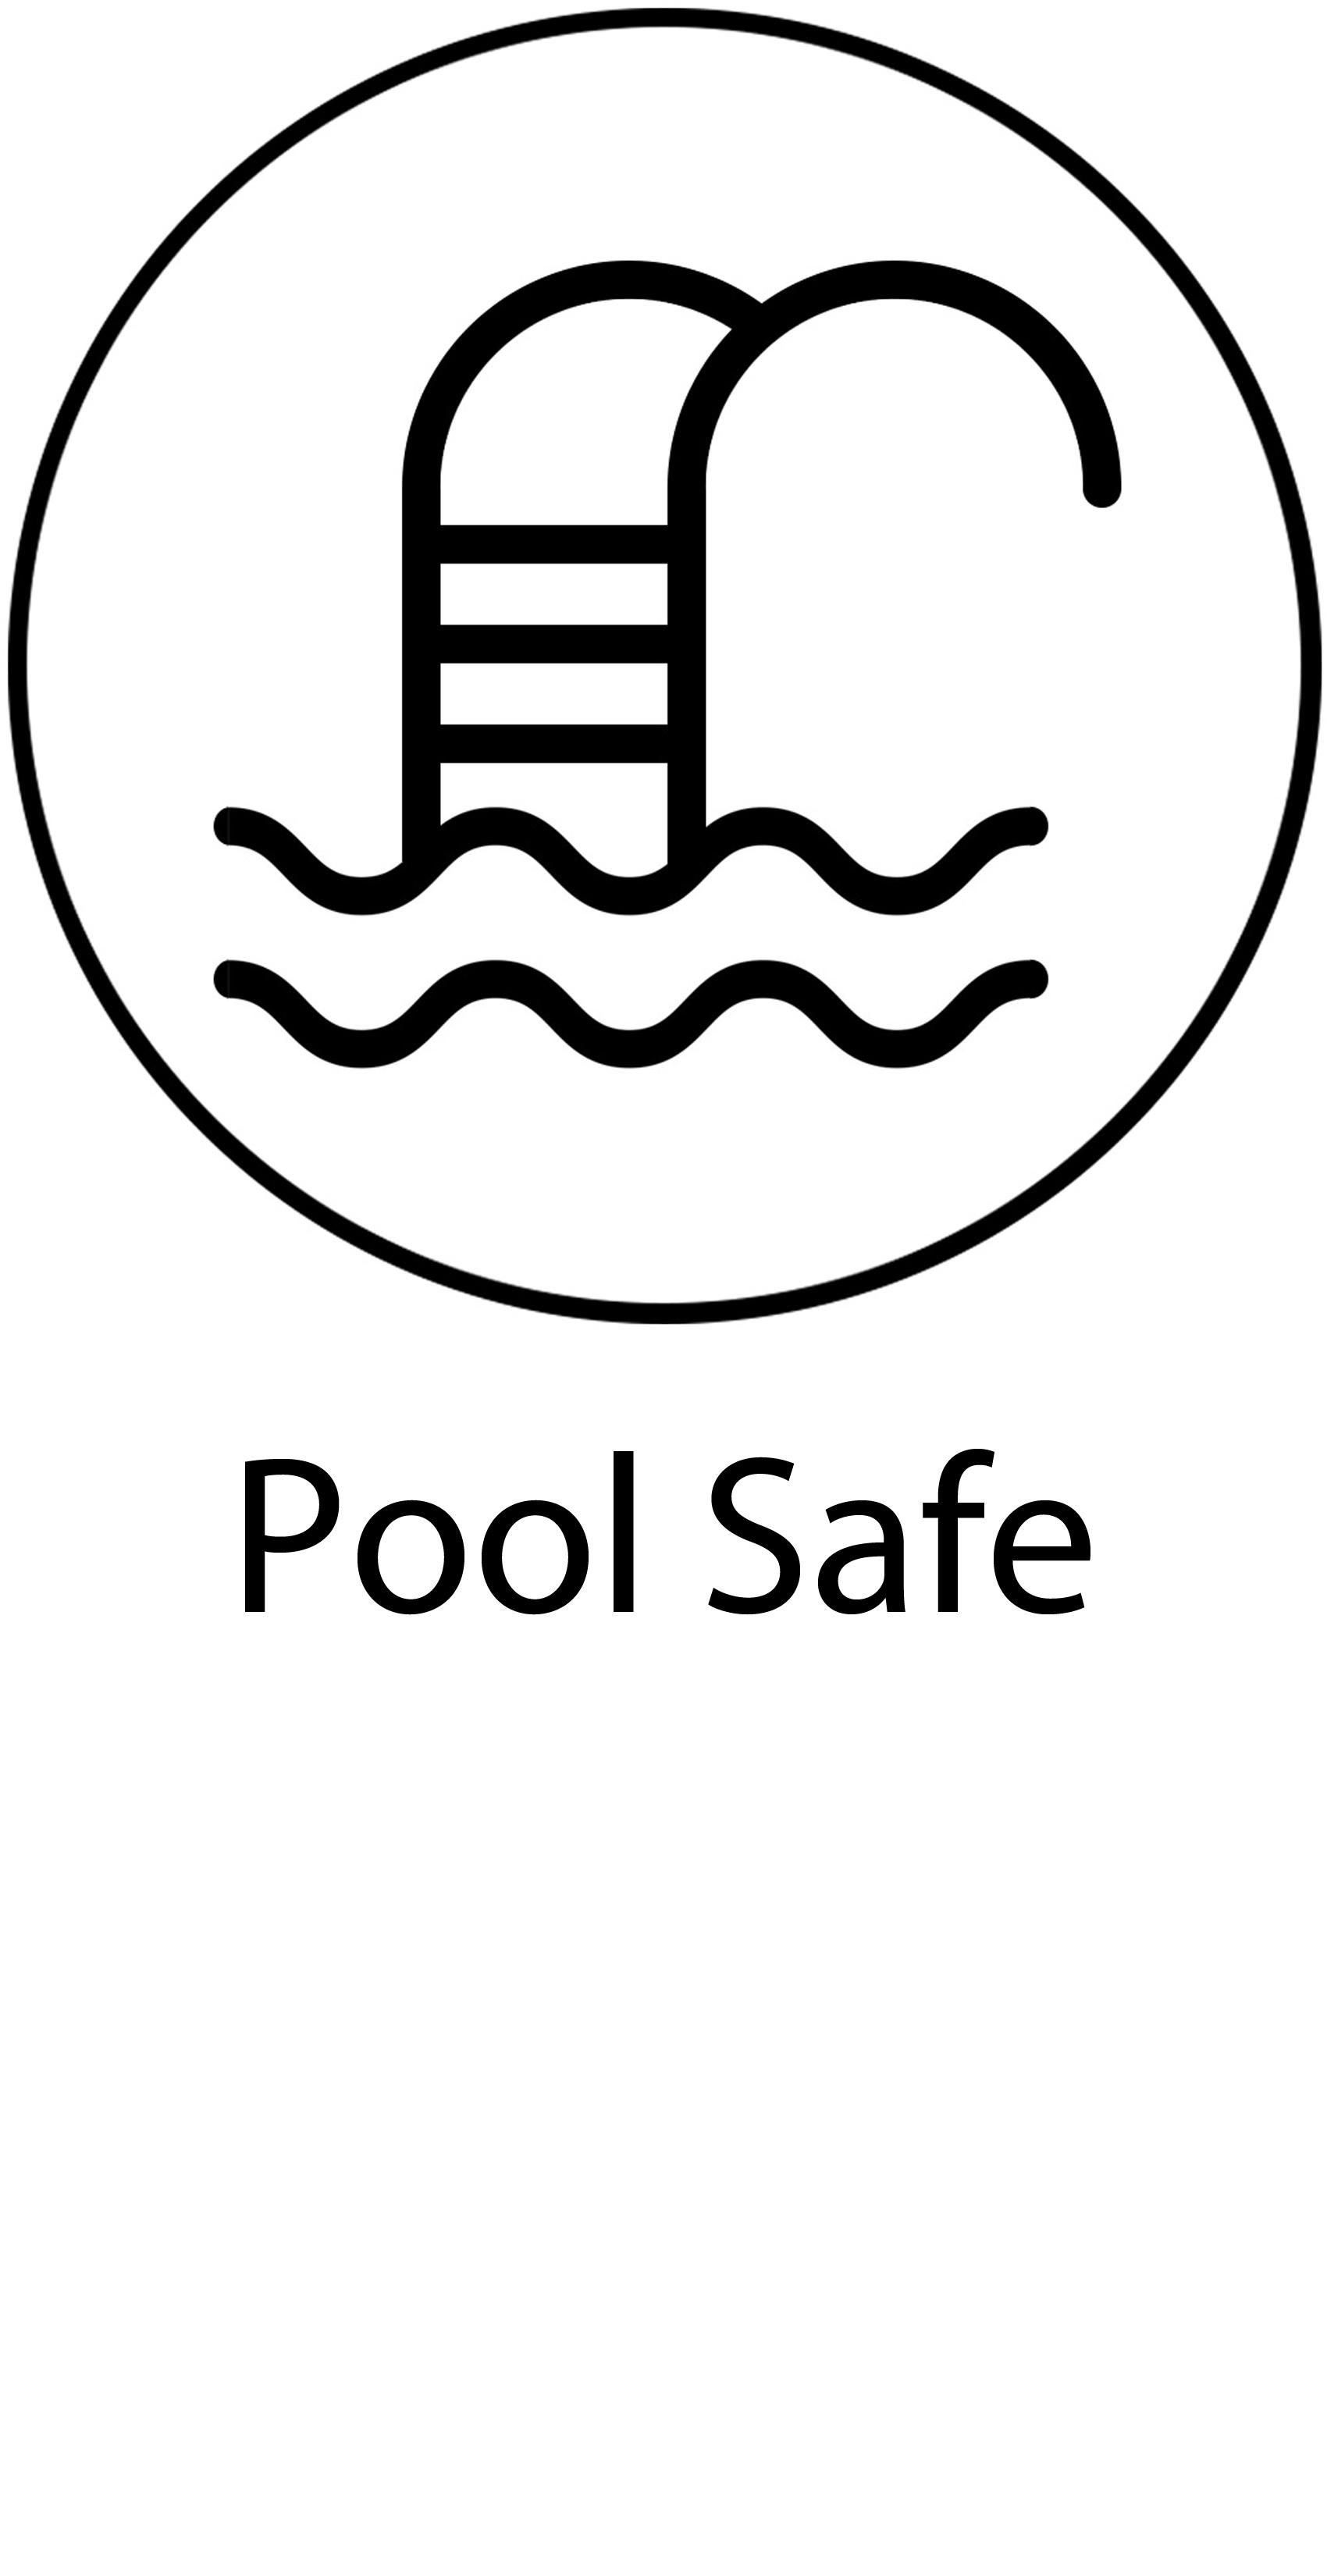 Pool Safe.jpg